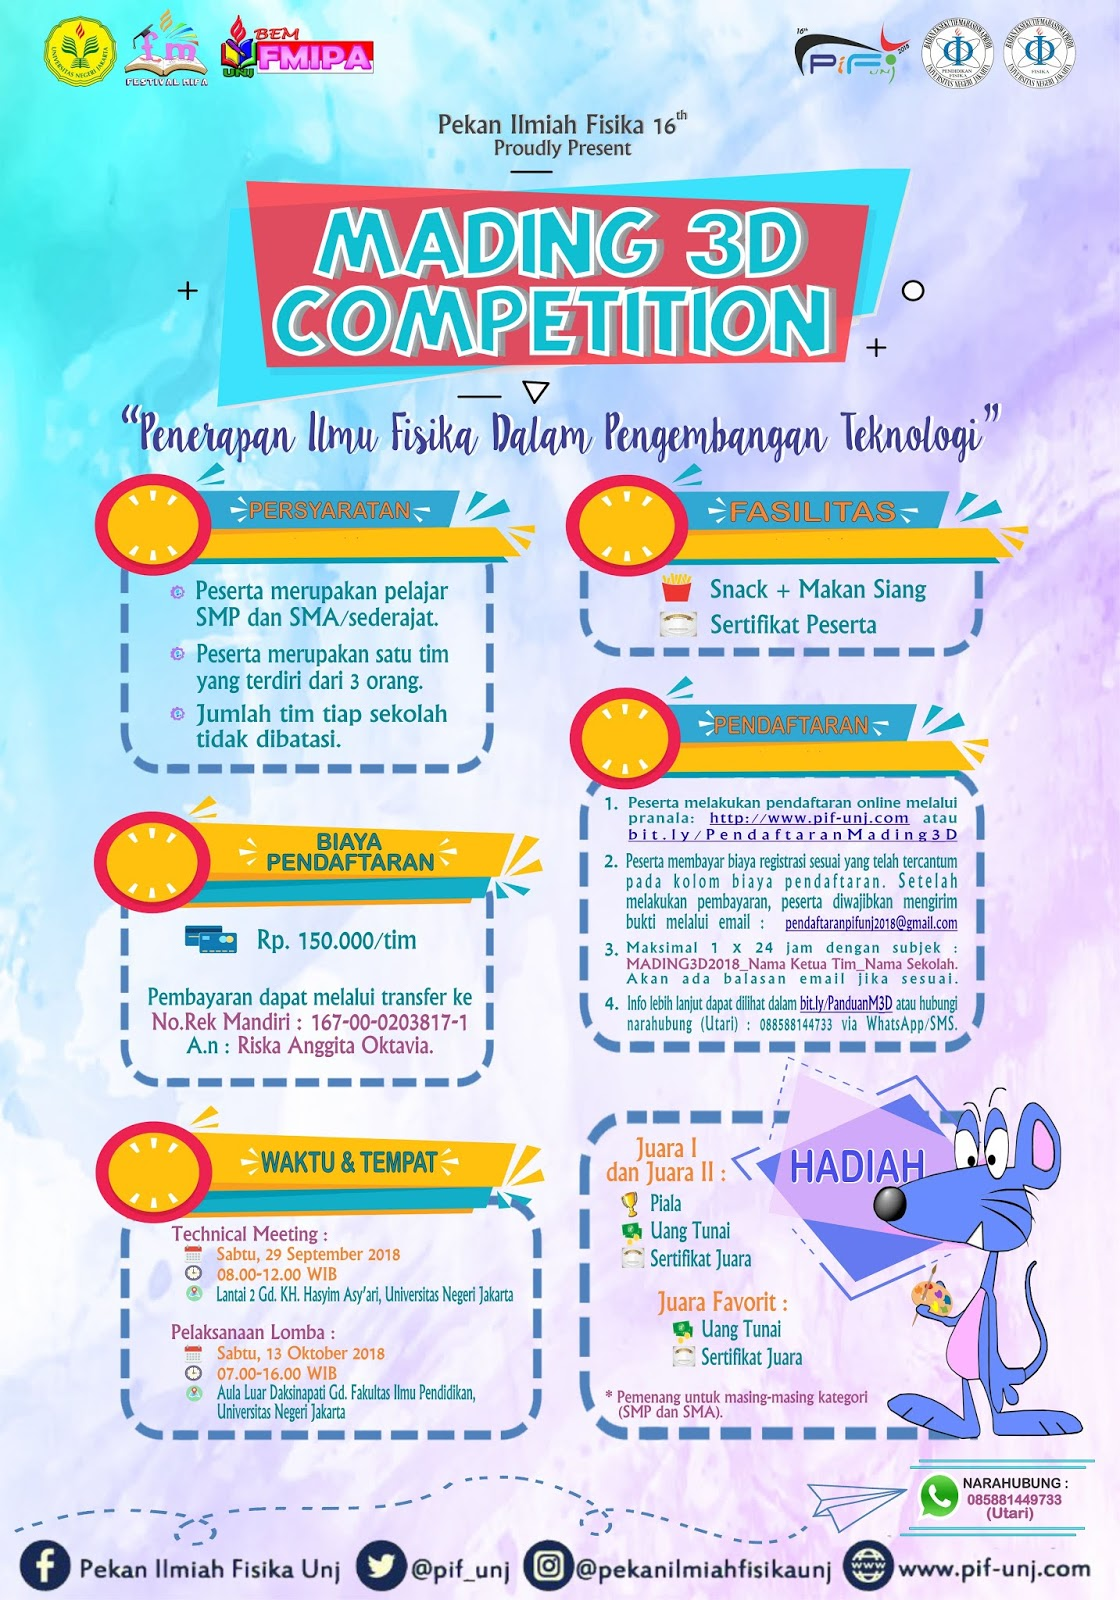 Pekan Ilmiah Fisika Universitas Negeri Jakarta Mading 3d Competition